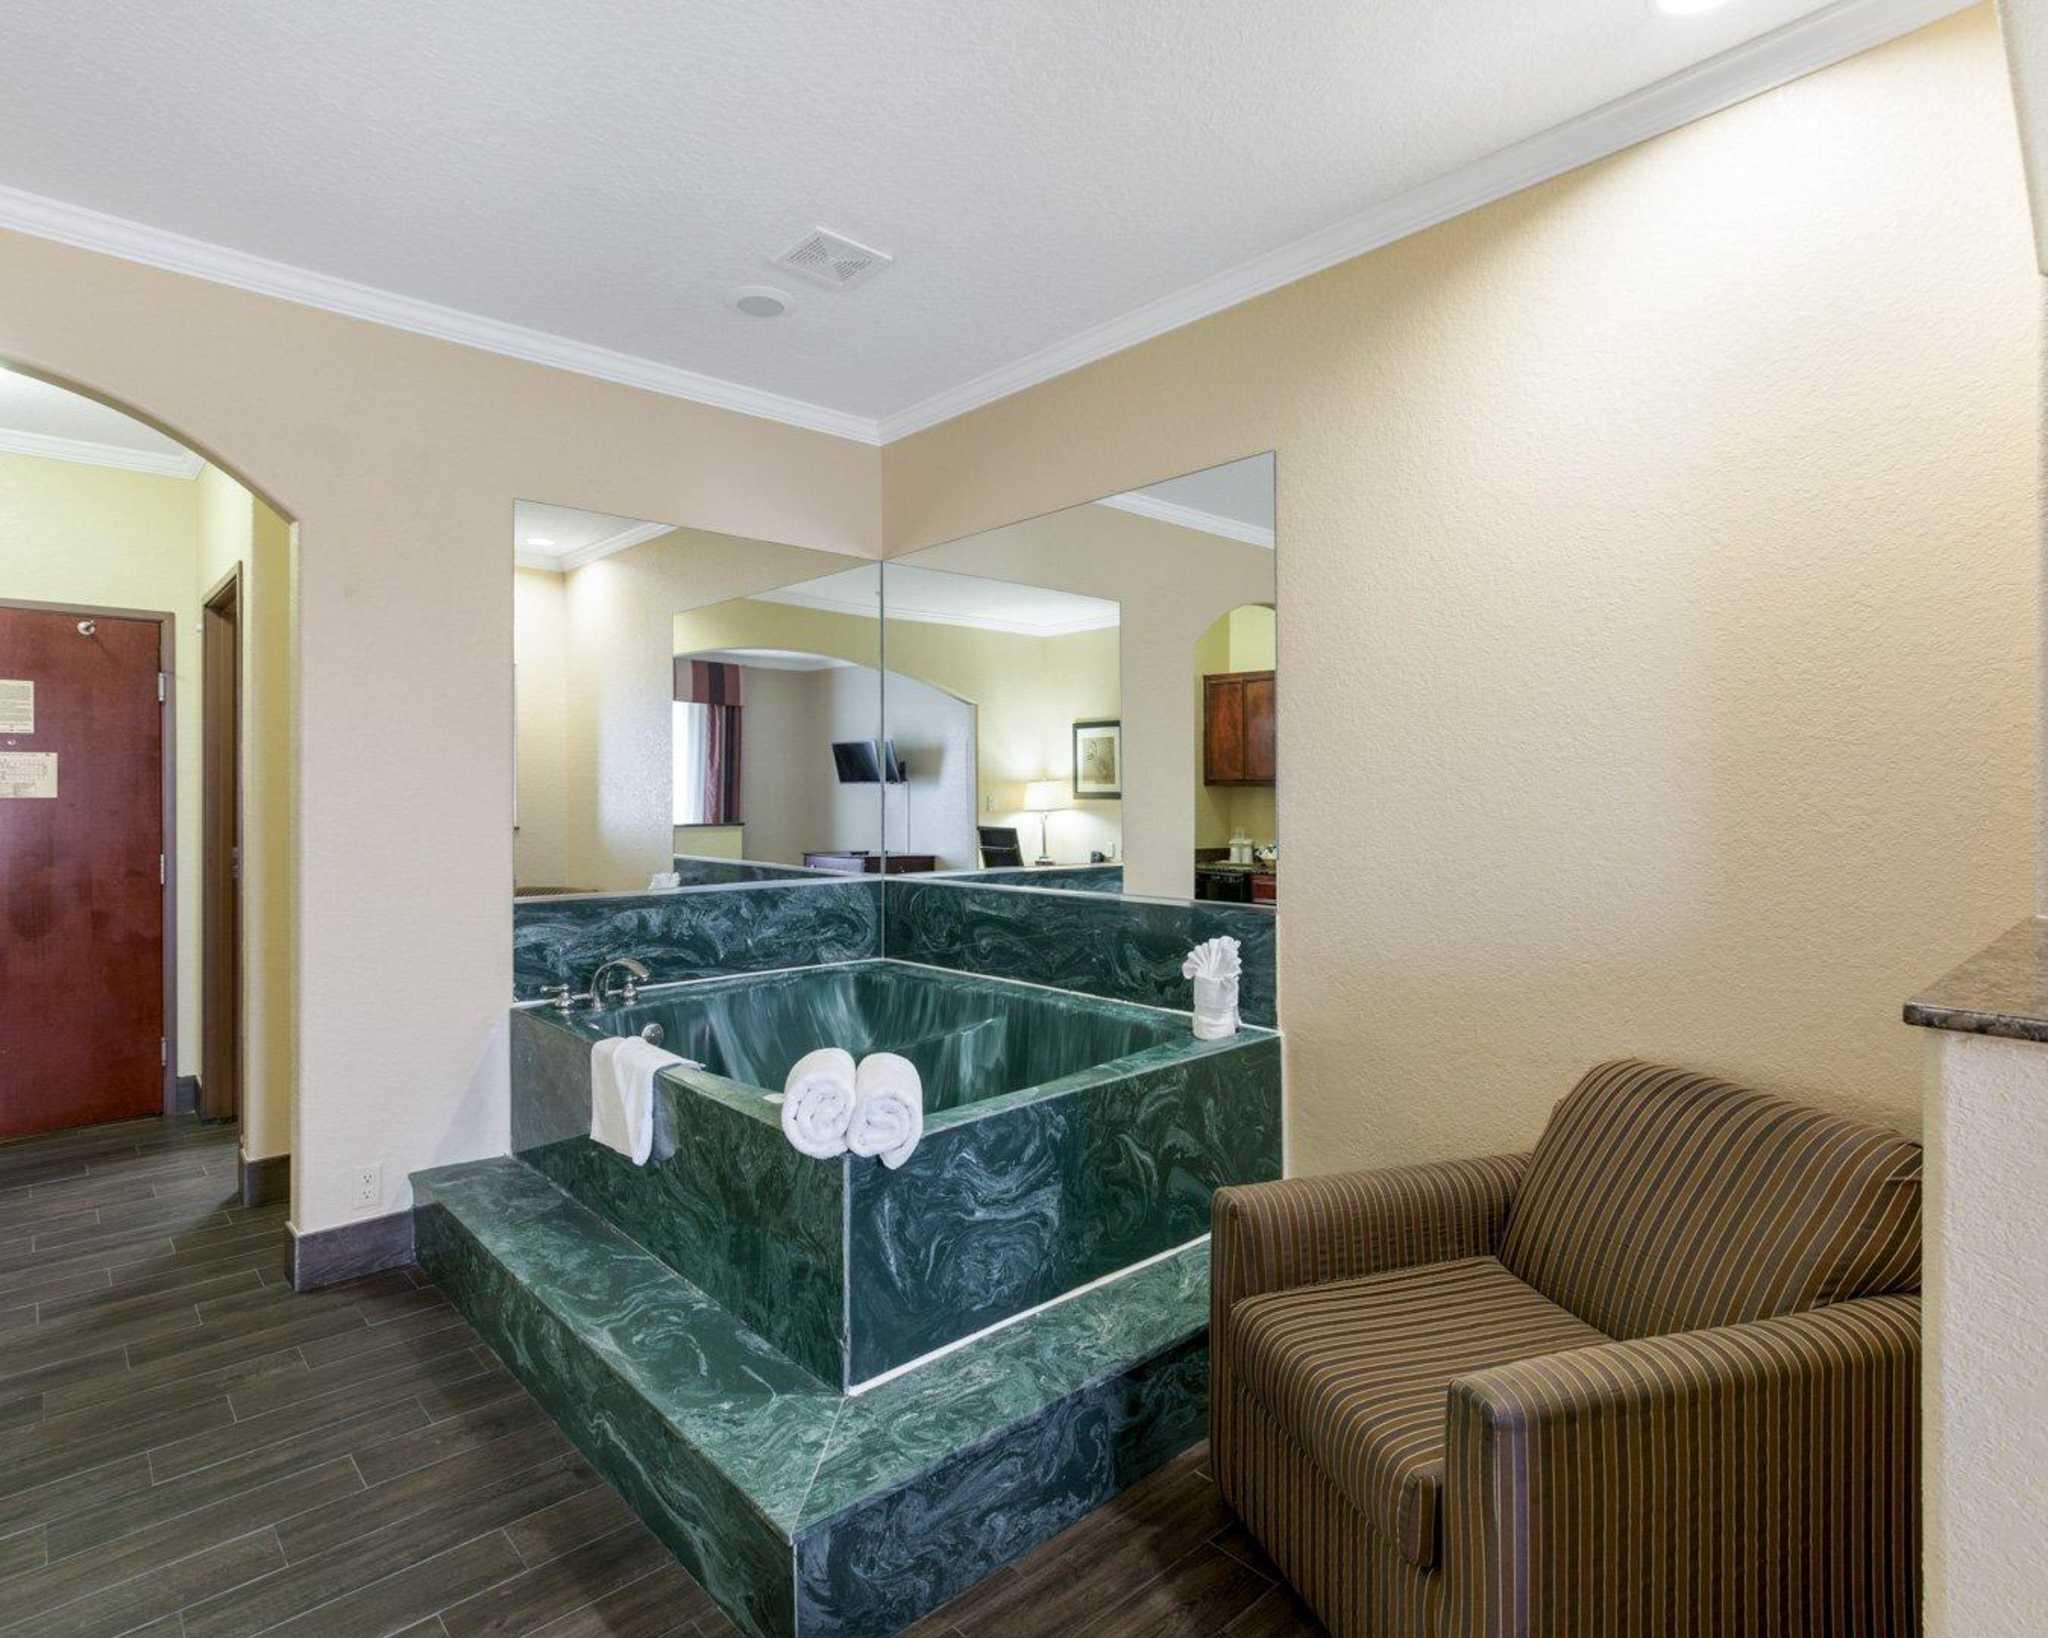 Comfort Suites image 42